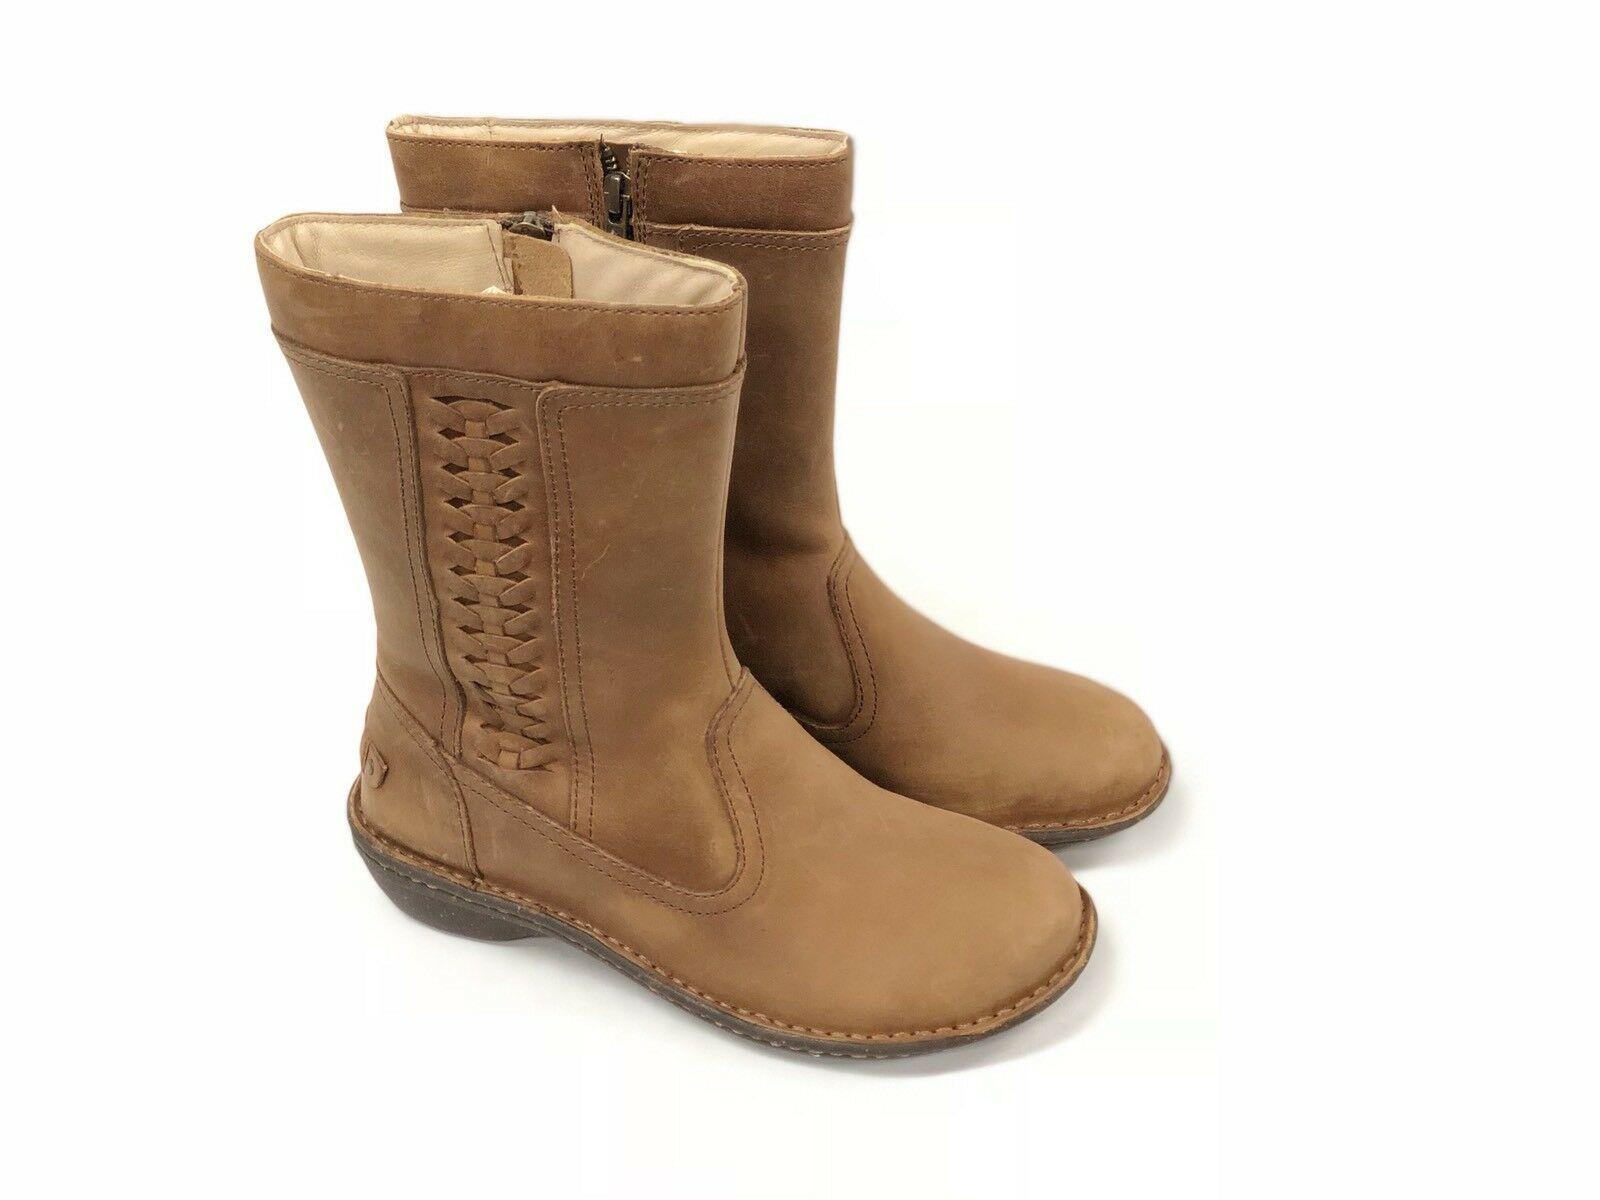 4990edb435f UGG Australia 1006083 Kaleen Leather Boots and 50 similar items